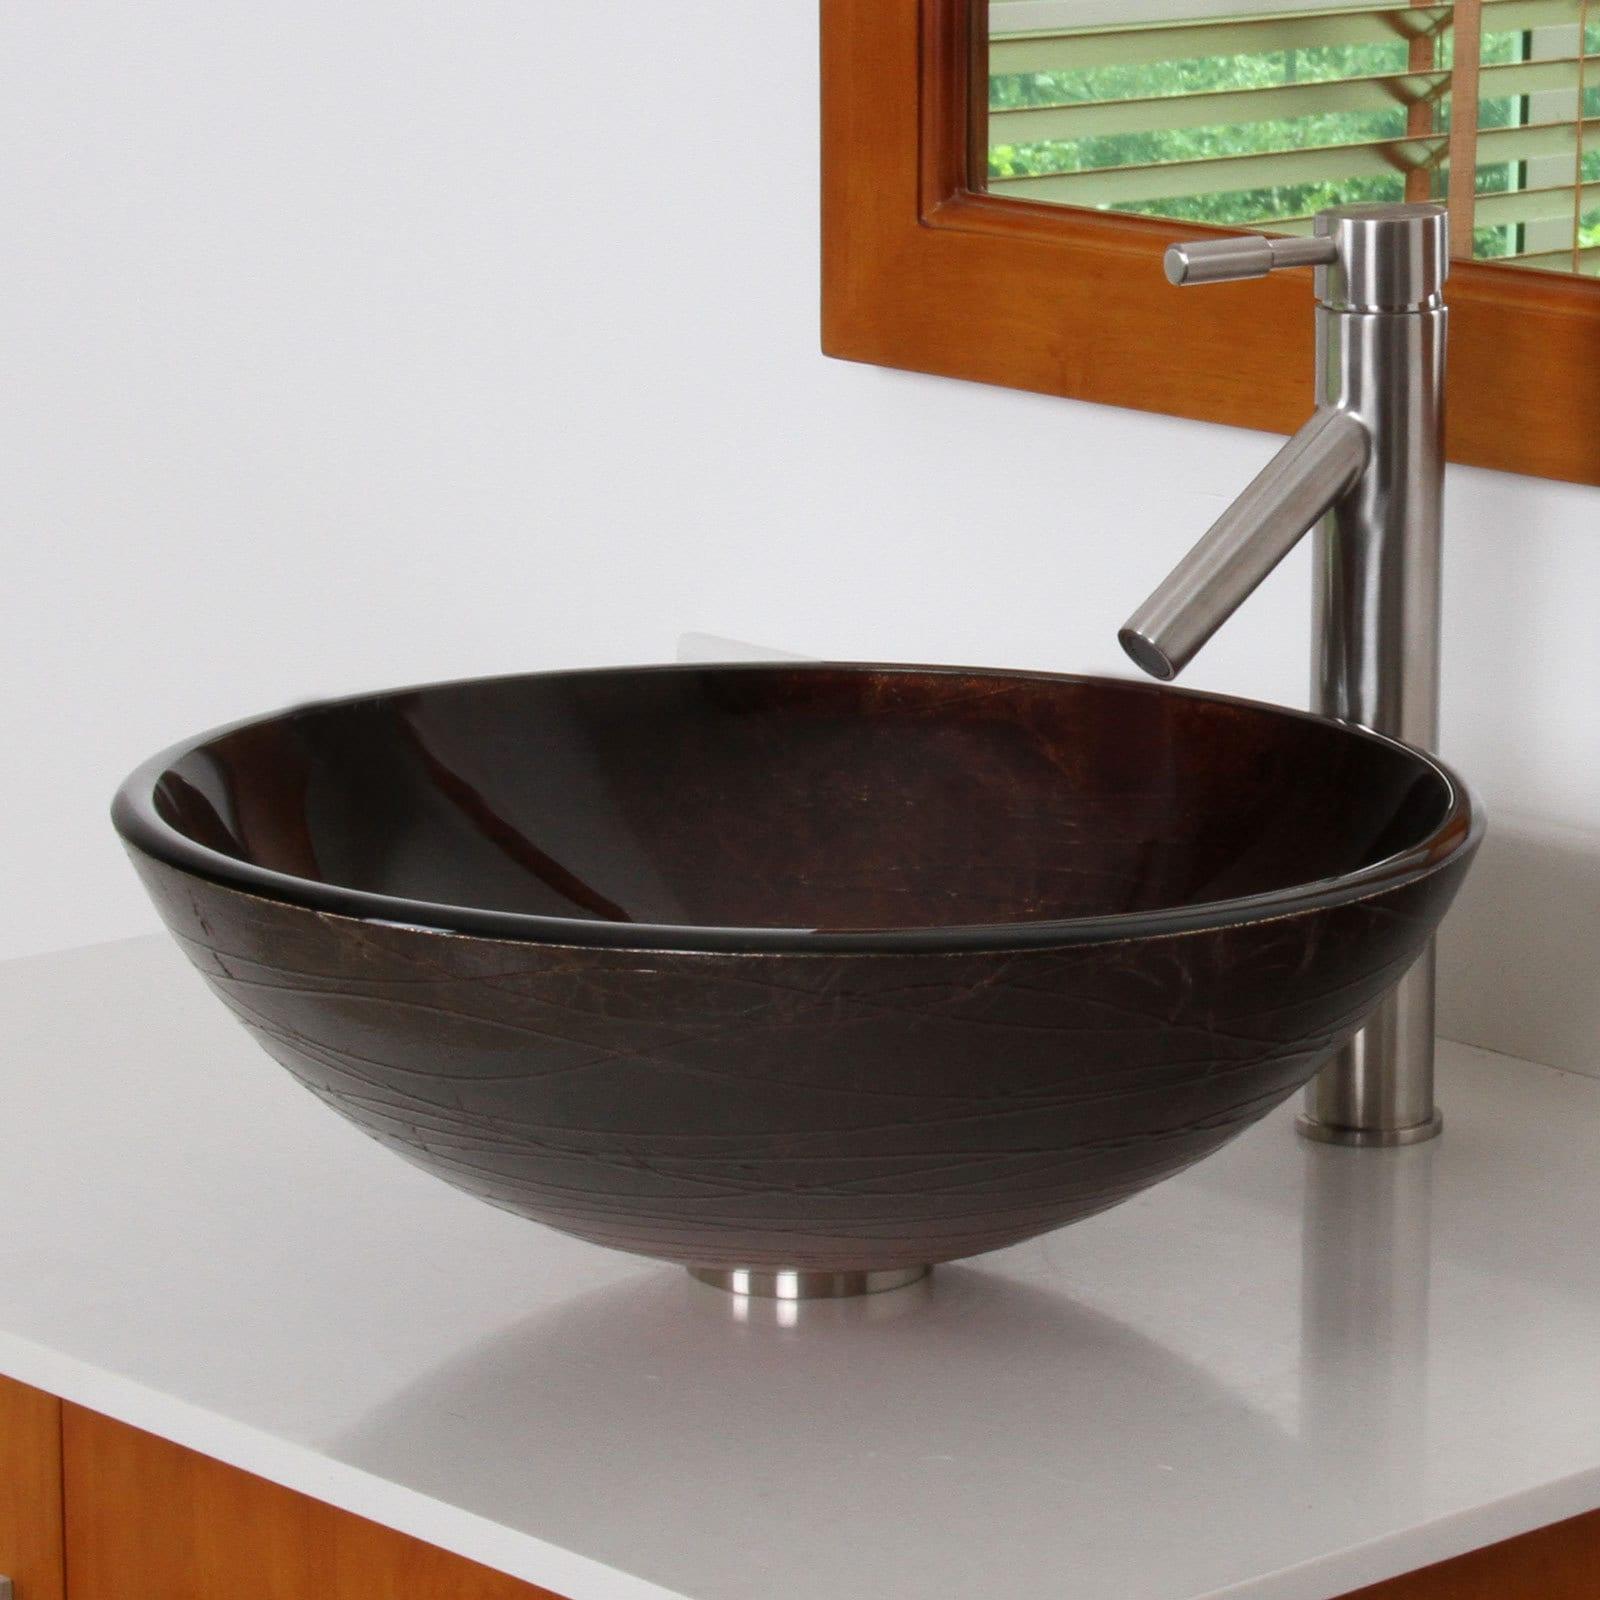 Elite Modern Design Tempered Glass Bathroom Vessel Sink with Faucet ...